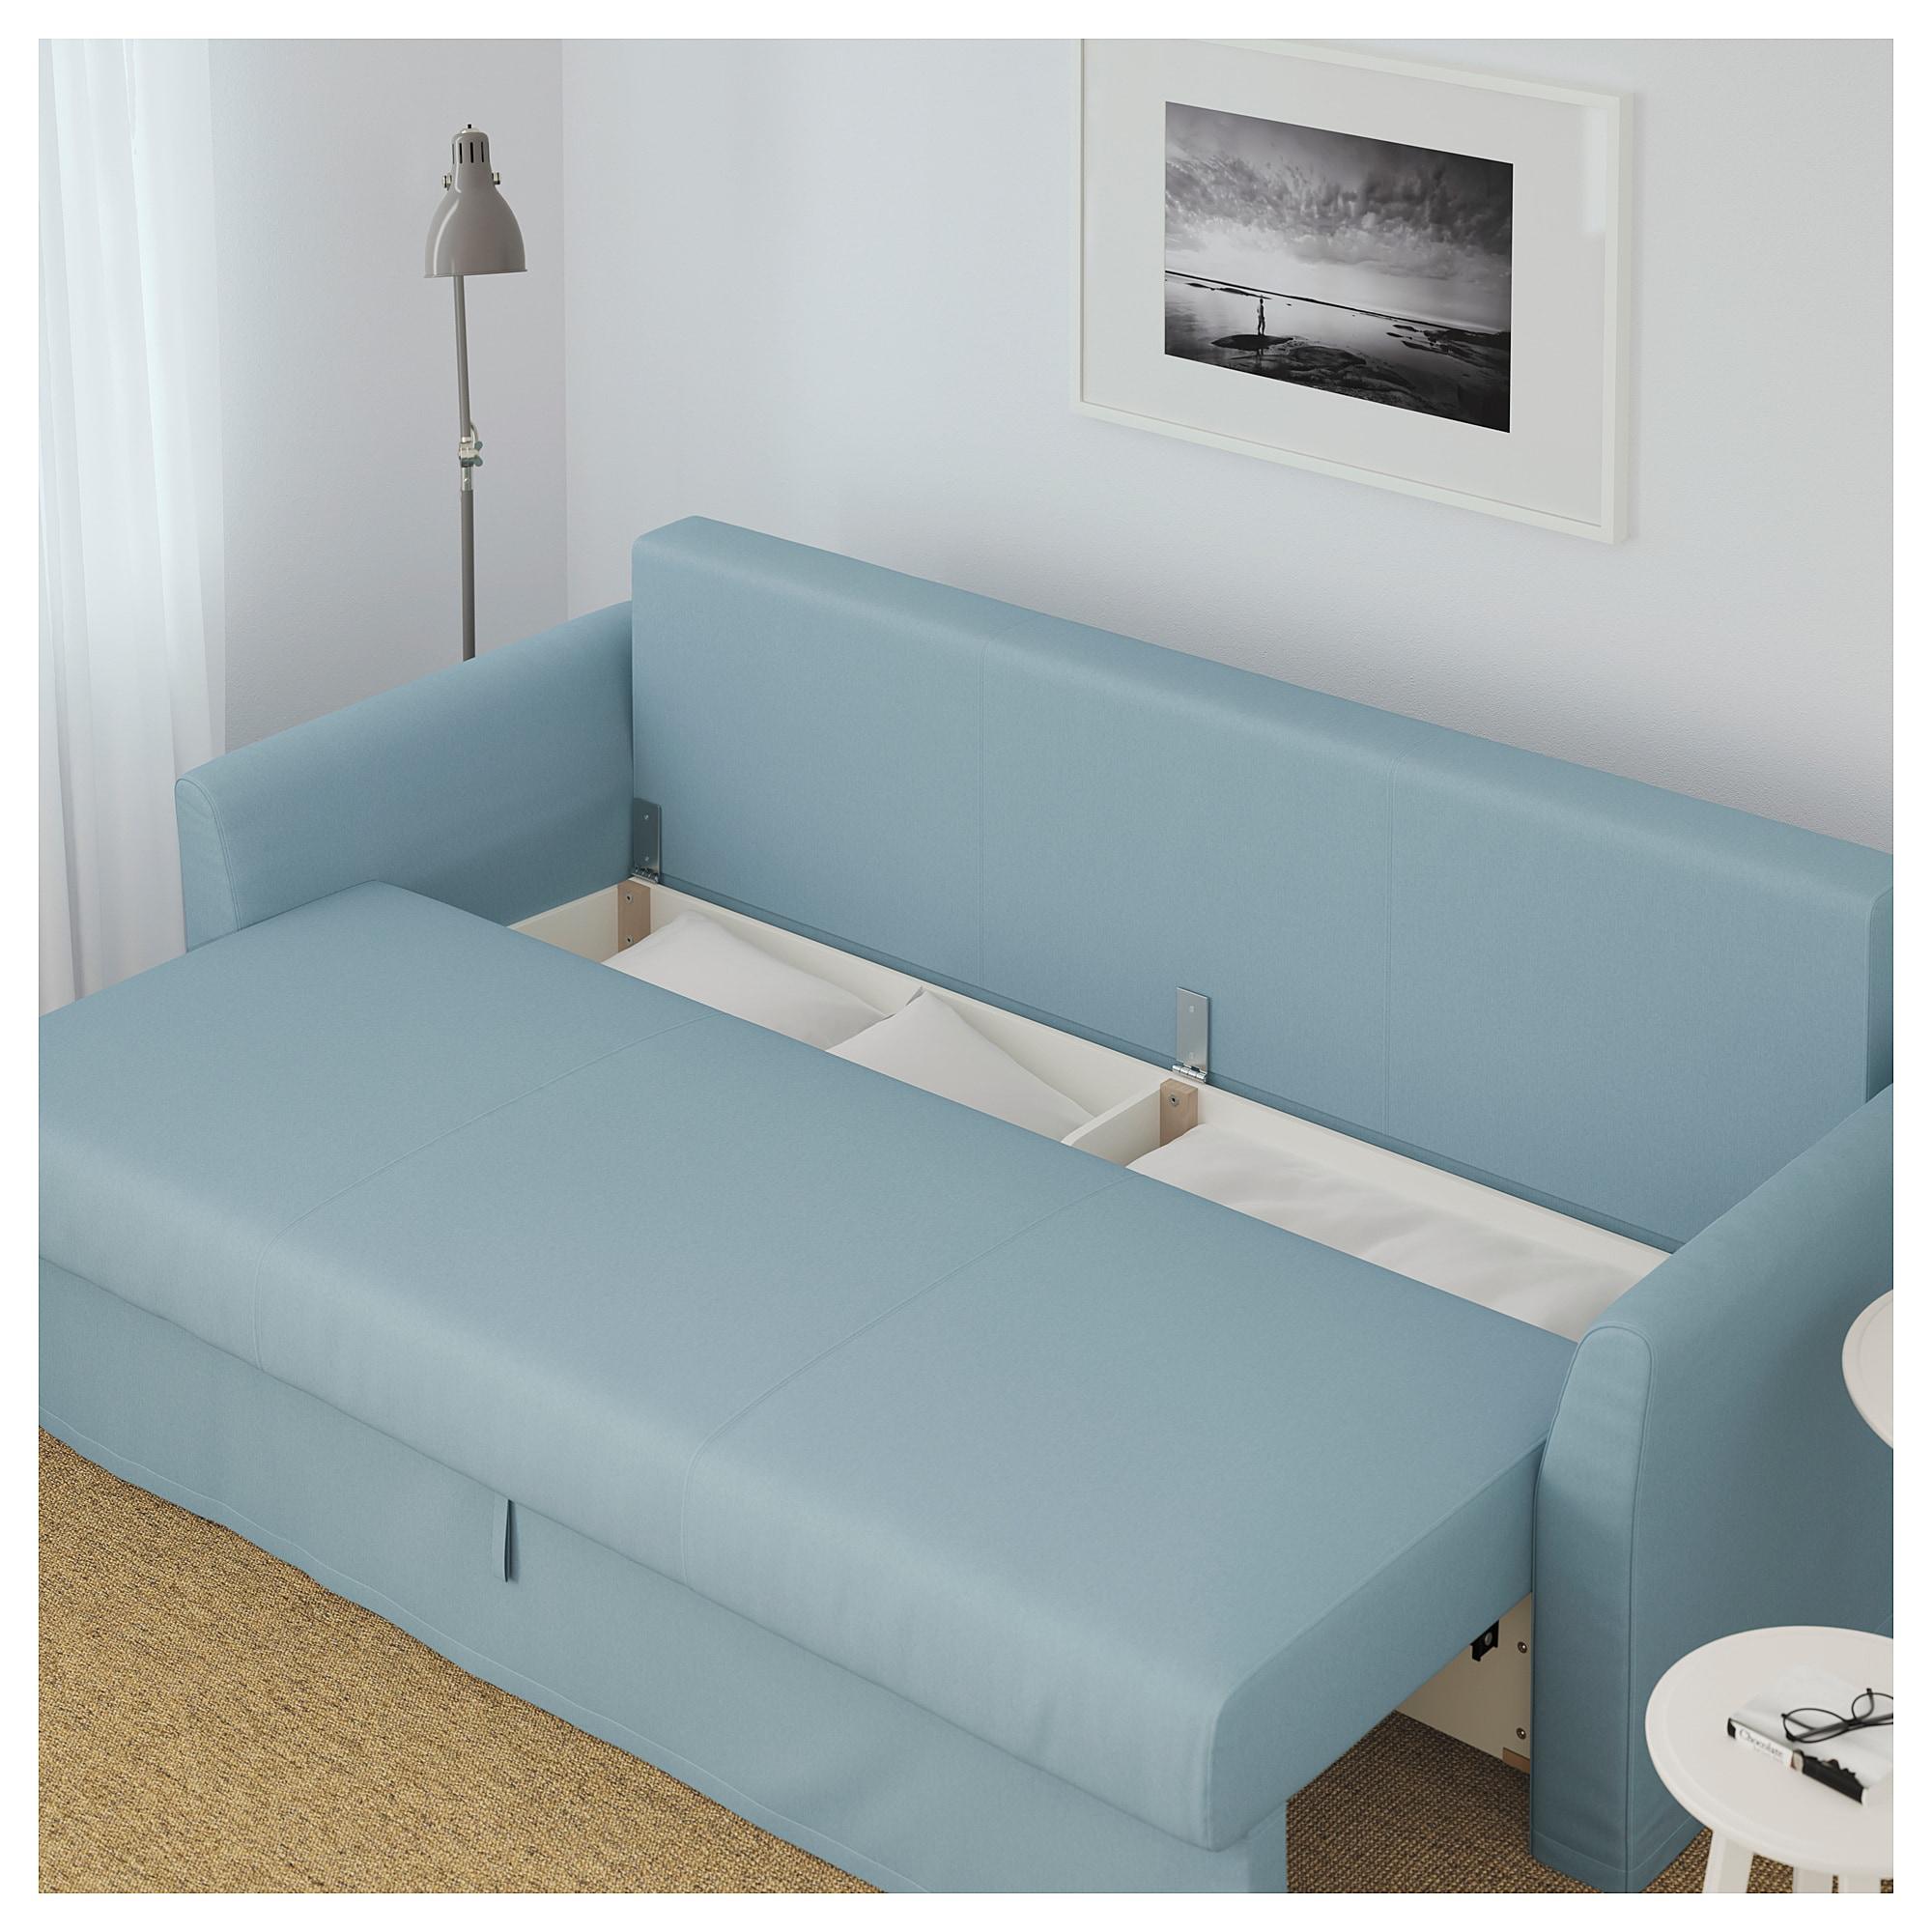 Canapés Convertibles Ikea Meilleur De Photos Holmsund Convertible 3 Places orrsta Bleu Clair Ikea